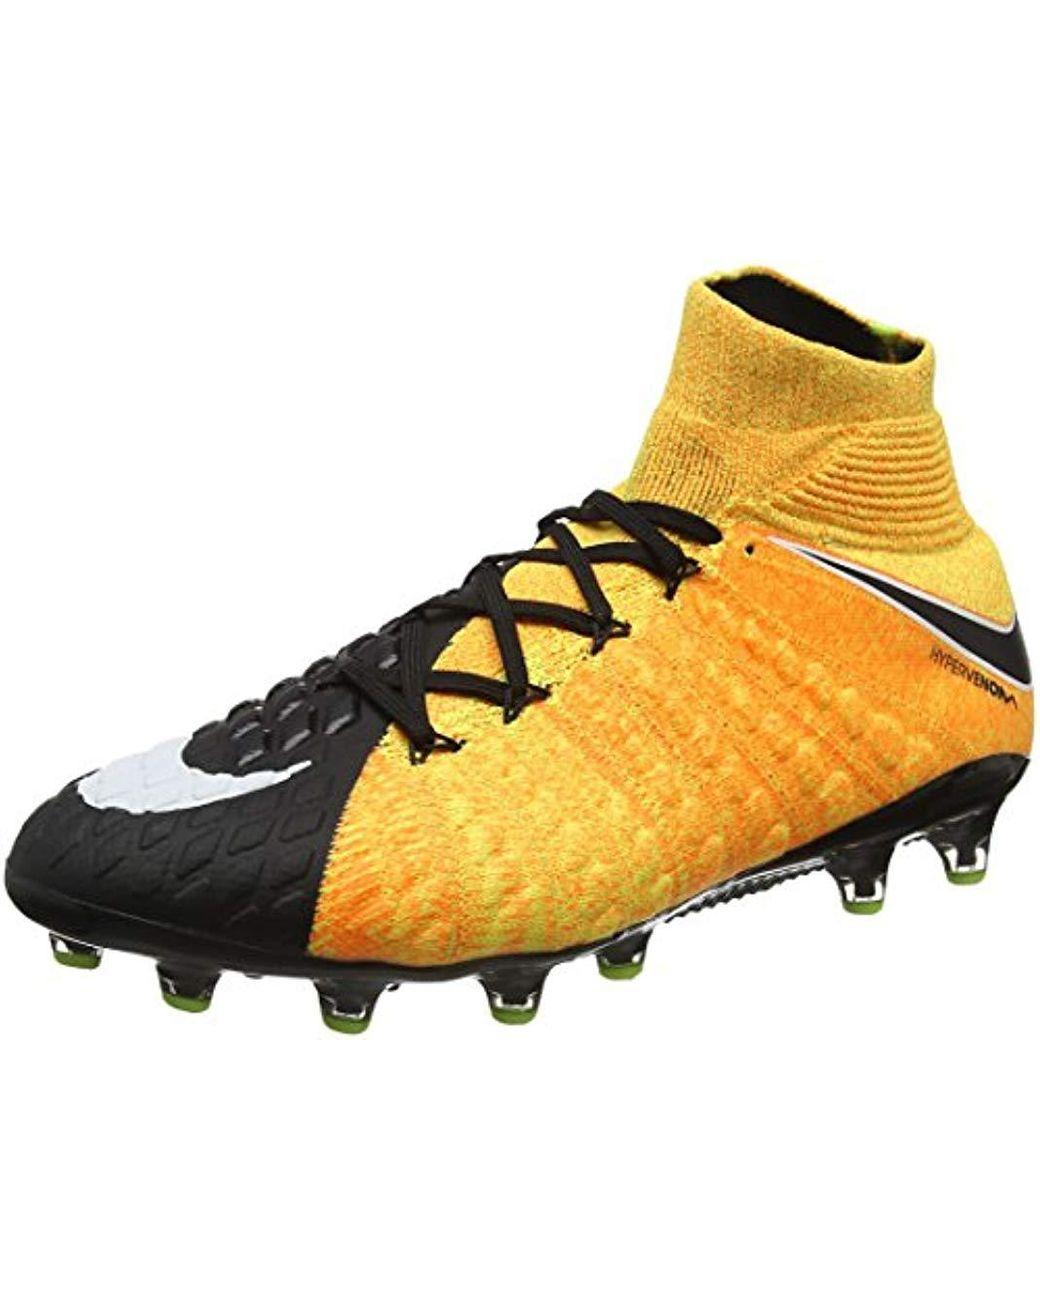 new product e5092 71fdc Men's Orange Hypervenom Phantom 3 Df Ag-pro Football Boots